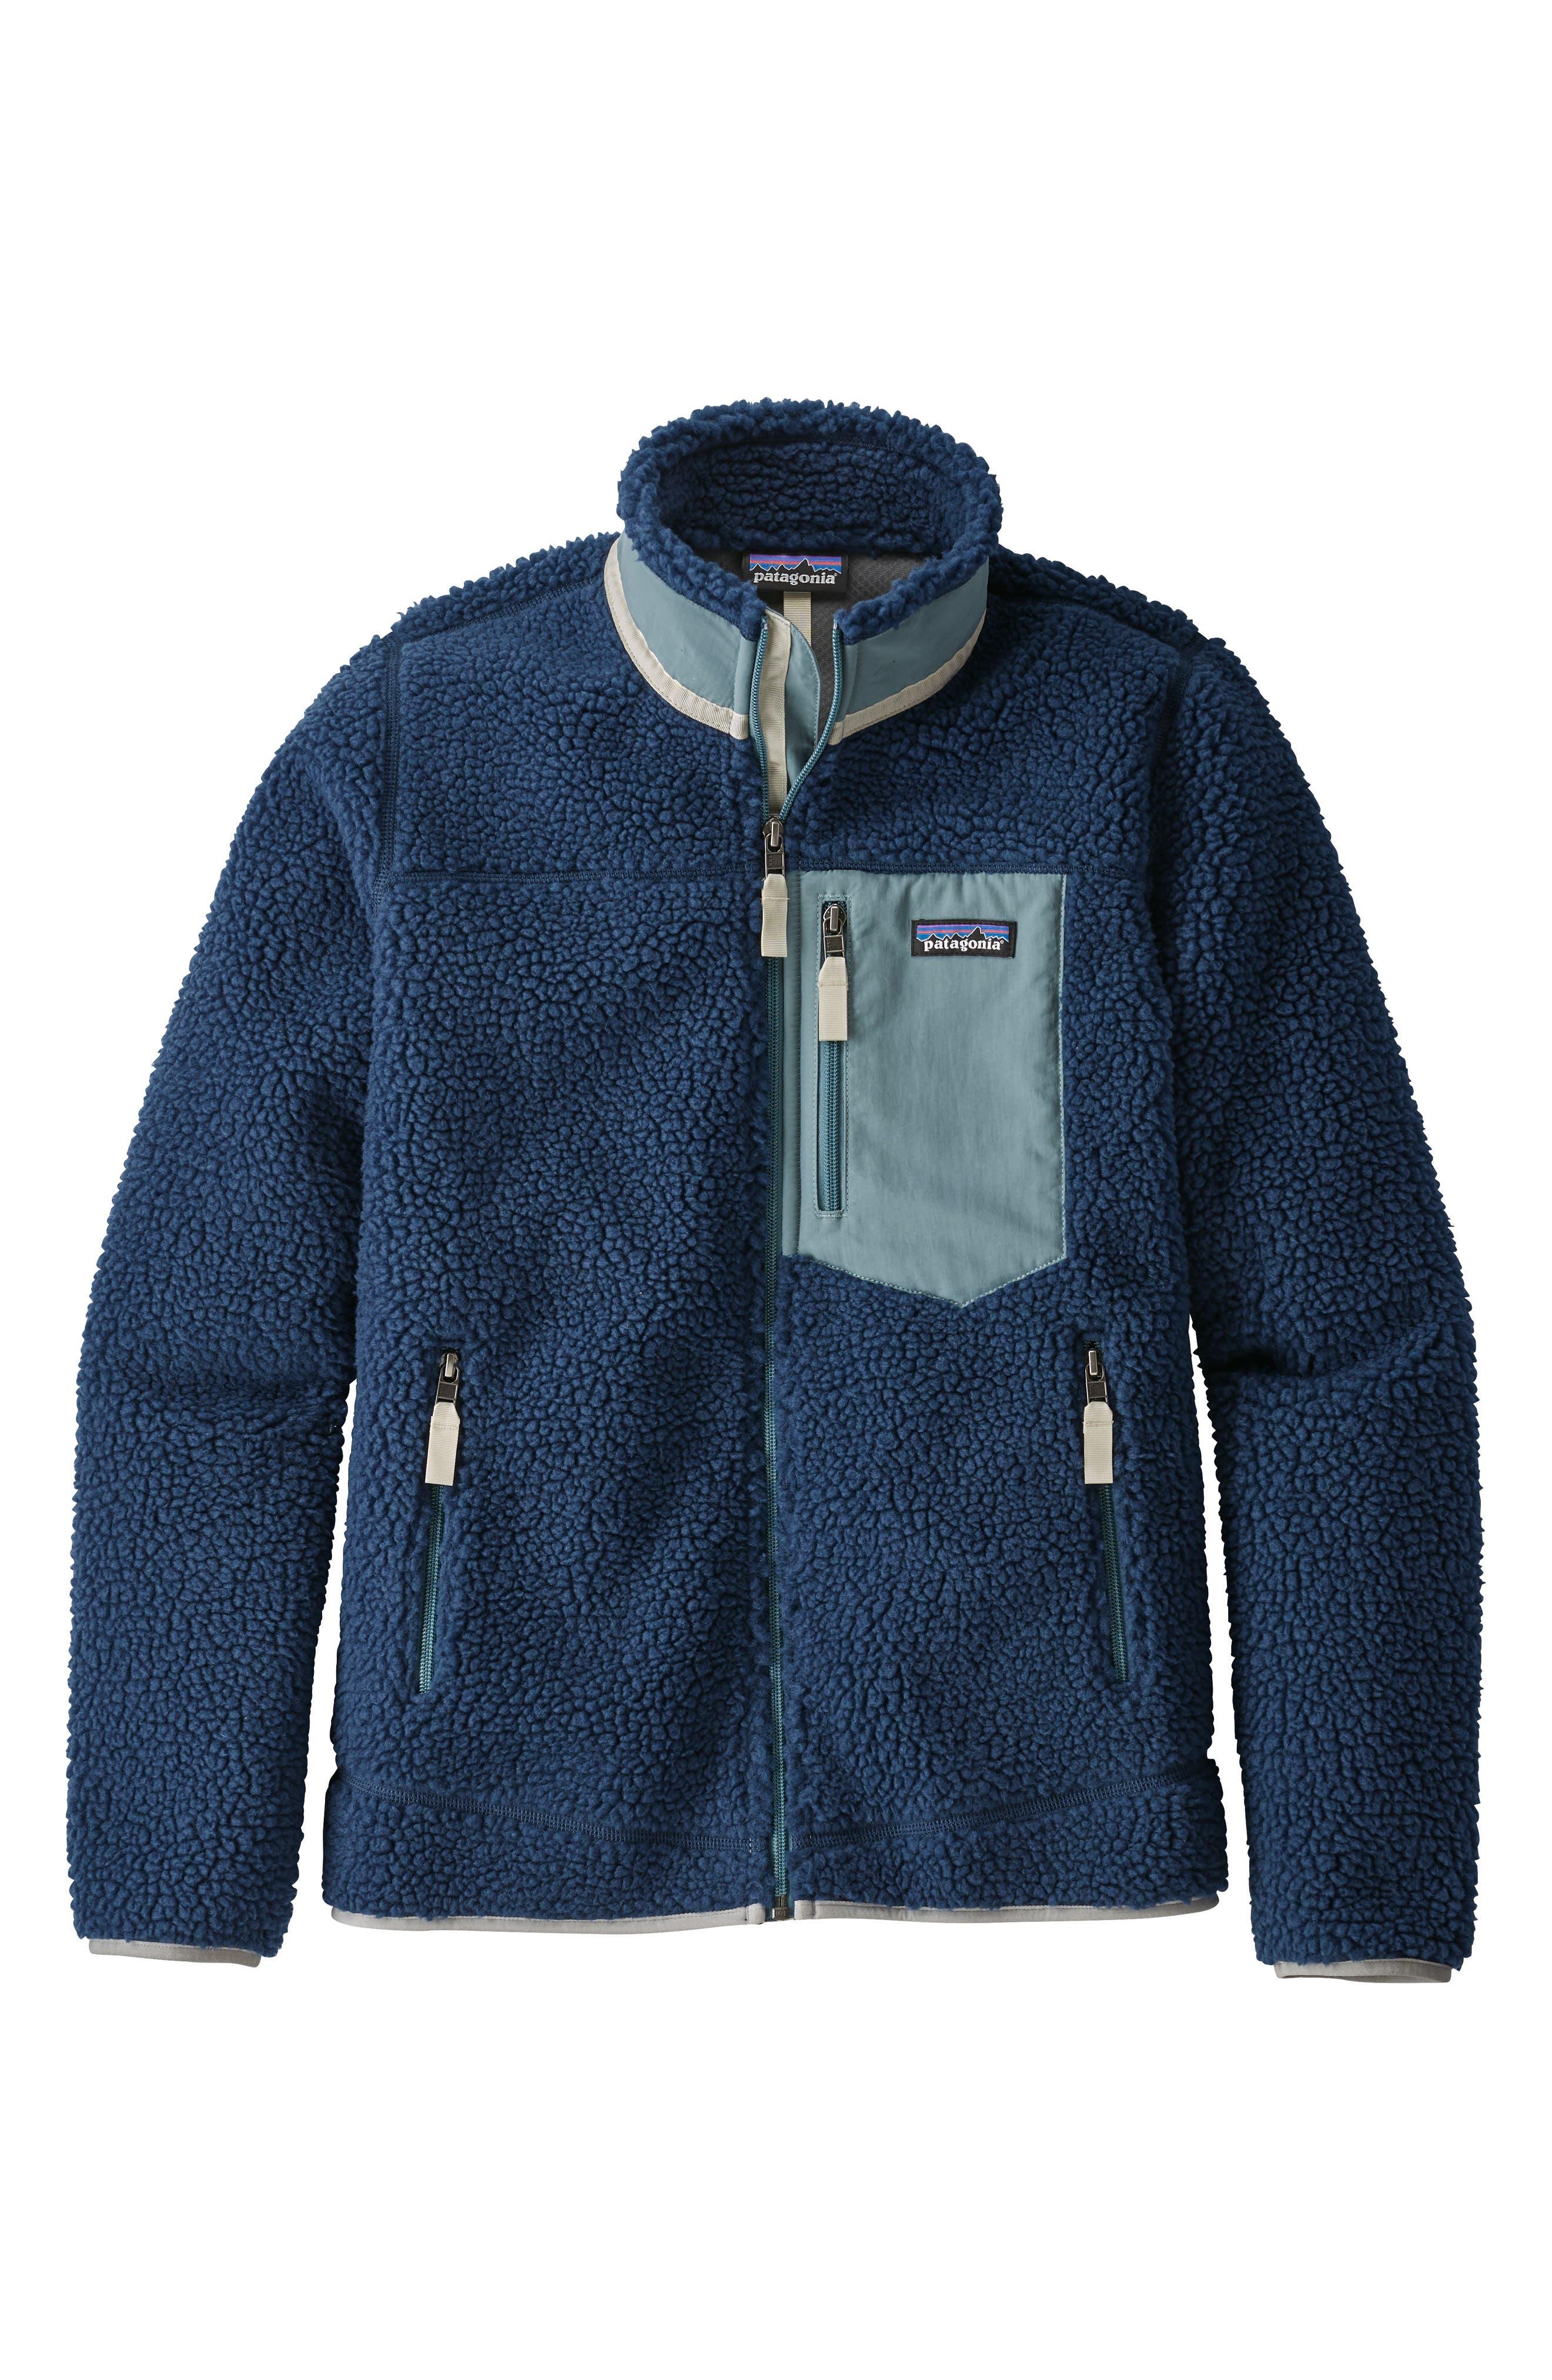 Classic Retro-X<sup>®</sup> Fleece Jacket,                             Main thumbnail 1, color,                             STONE BLUE